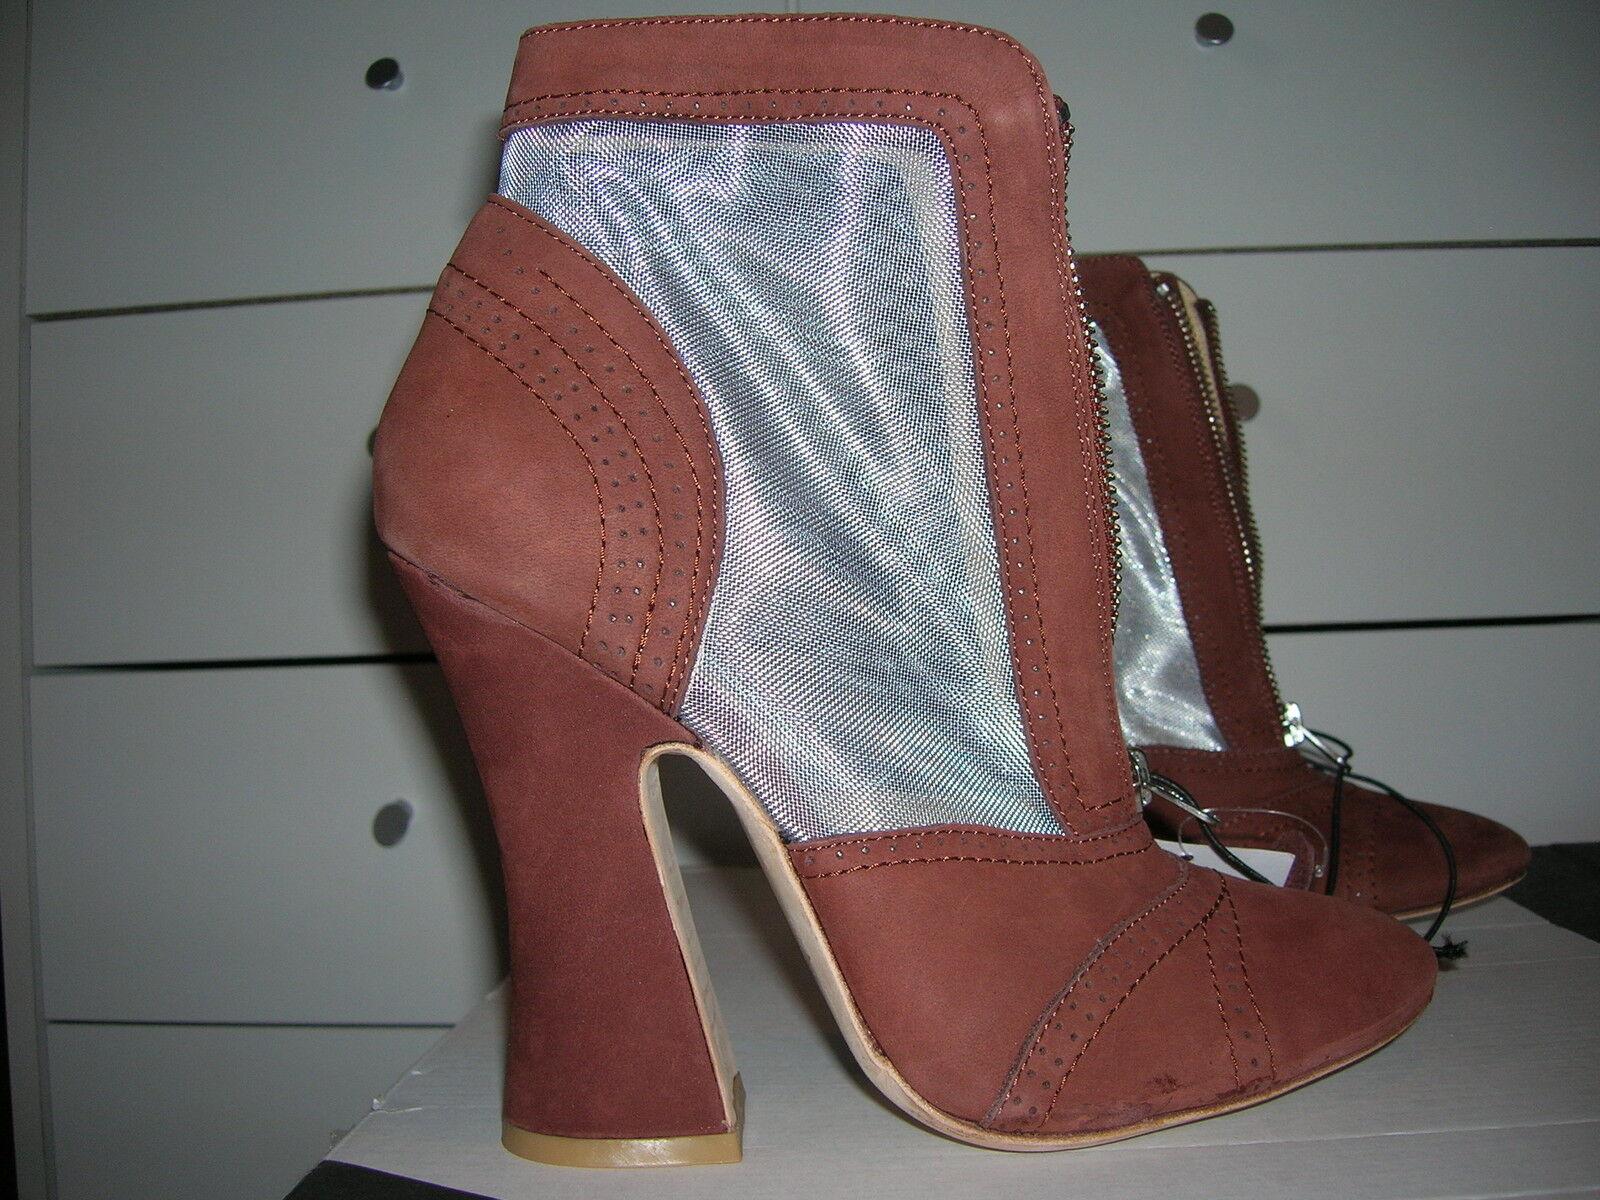 botas botas botas talla UK 5 EU 38 Natural Gamuza H&M  mejor calidad